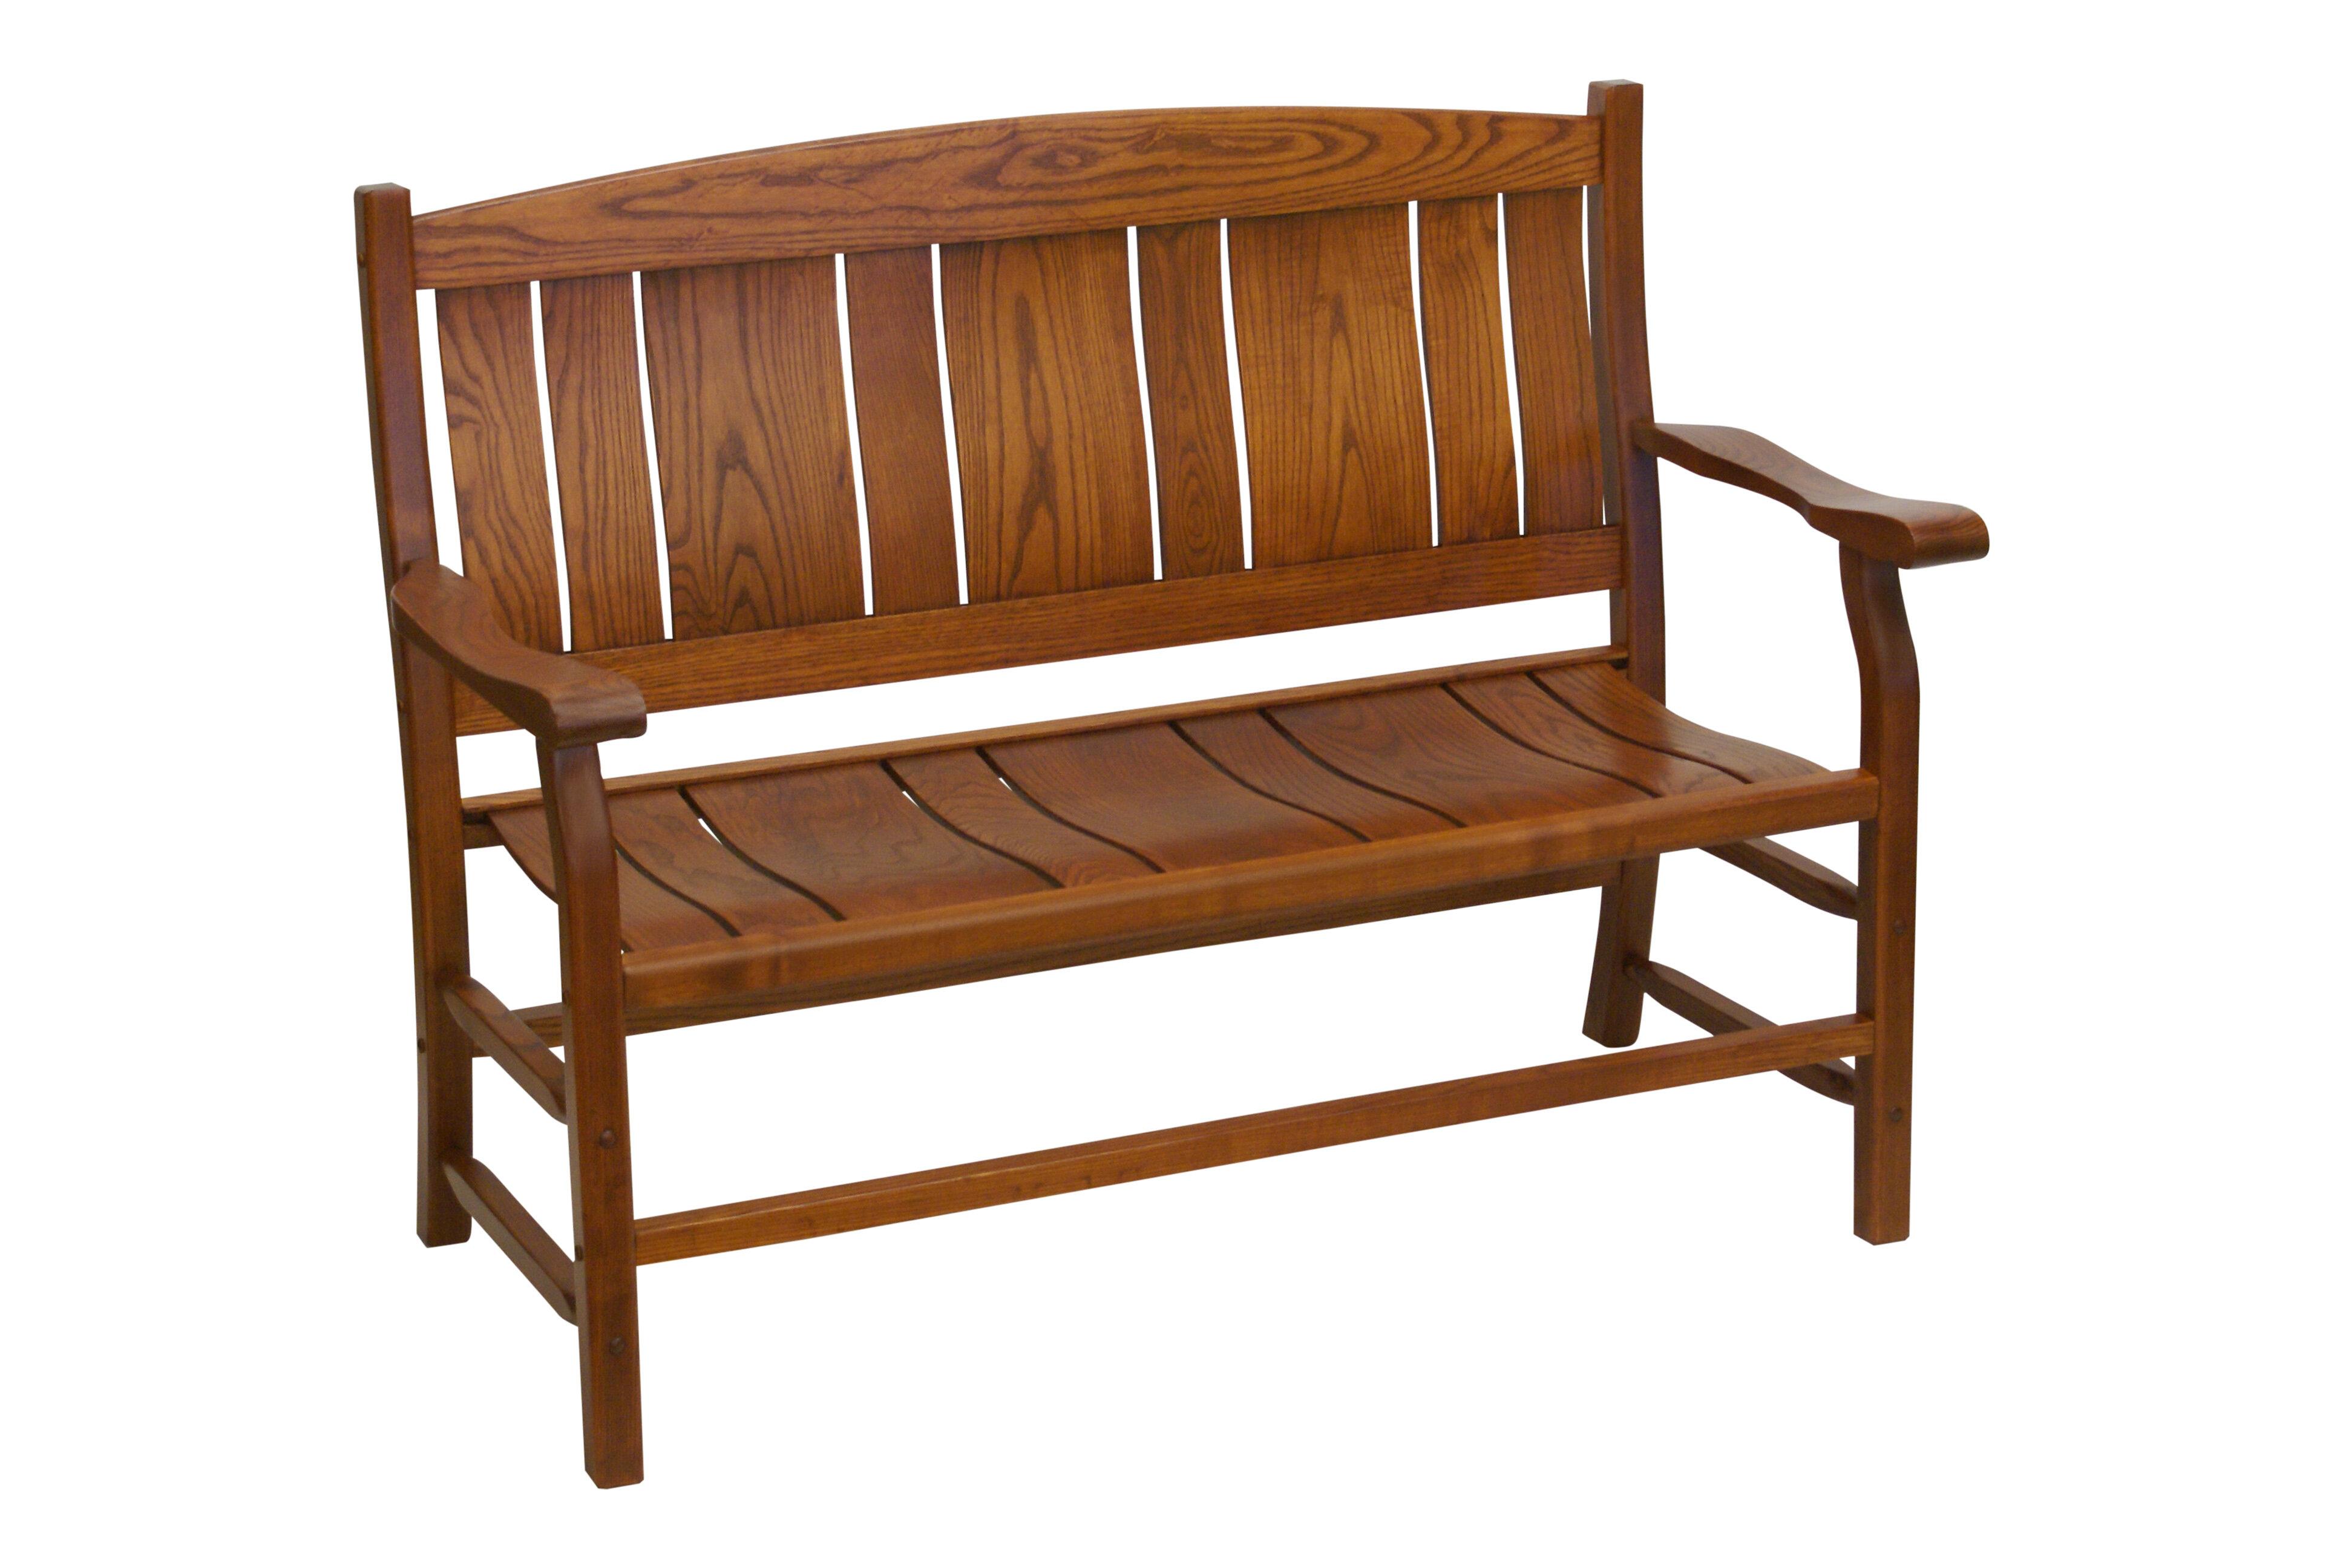 Red Oak Kitchen Table, Alcott Hill Grindle Slat Back Wooden Garden Bench Wayfair